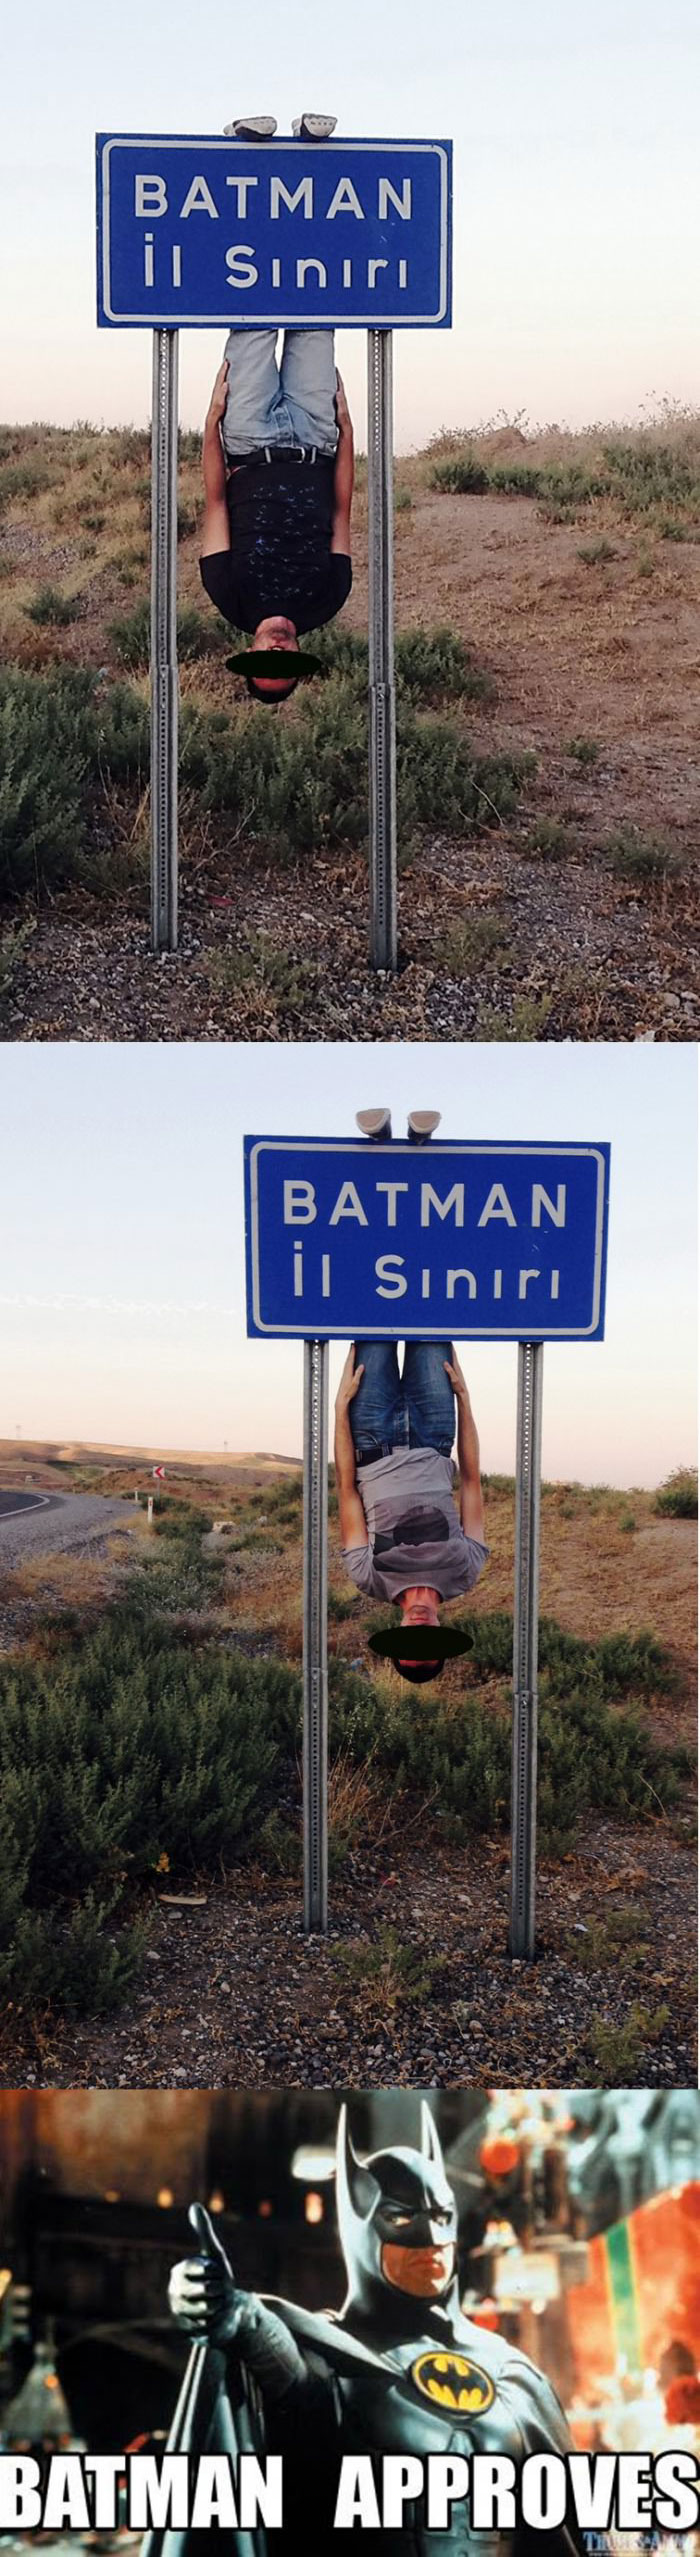 hanging upside down from a batman sign, batman approves